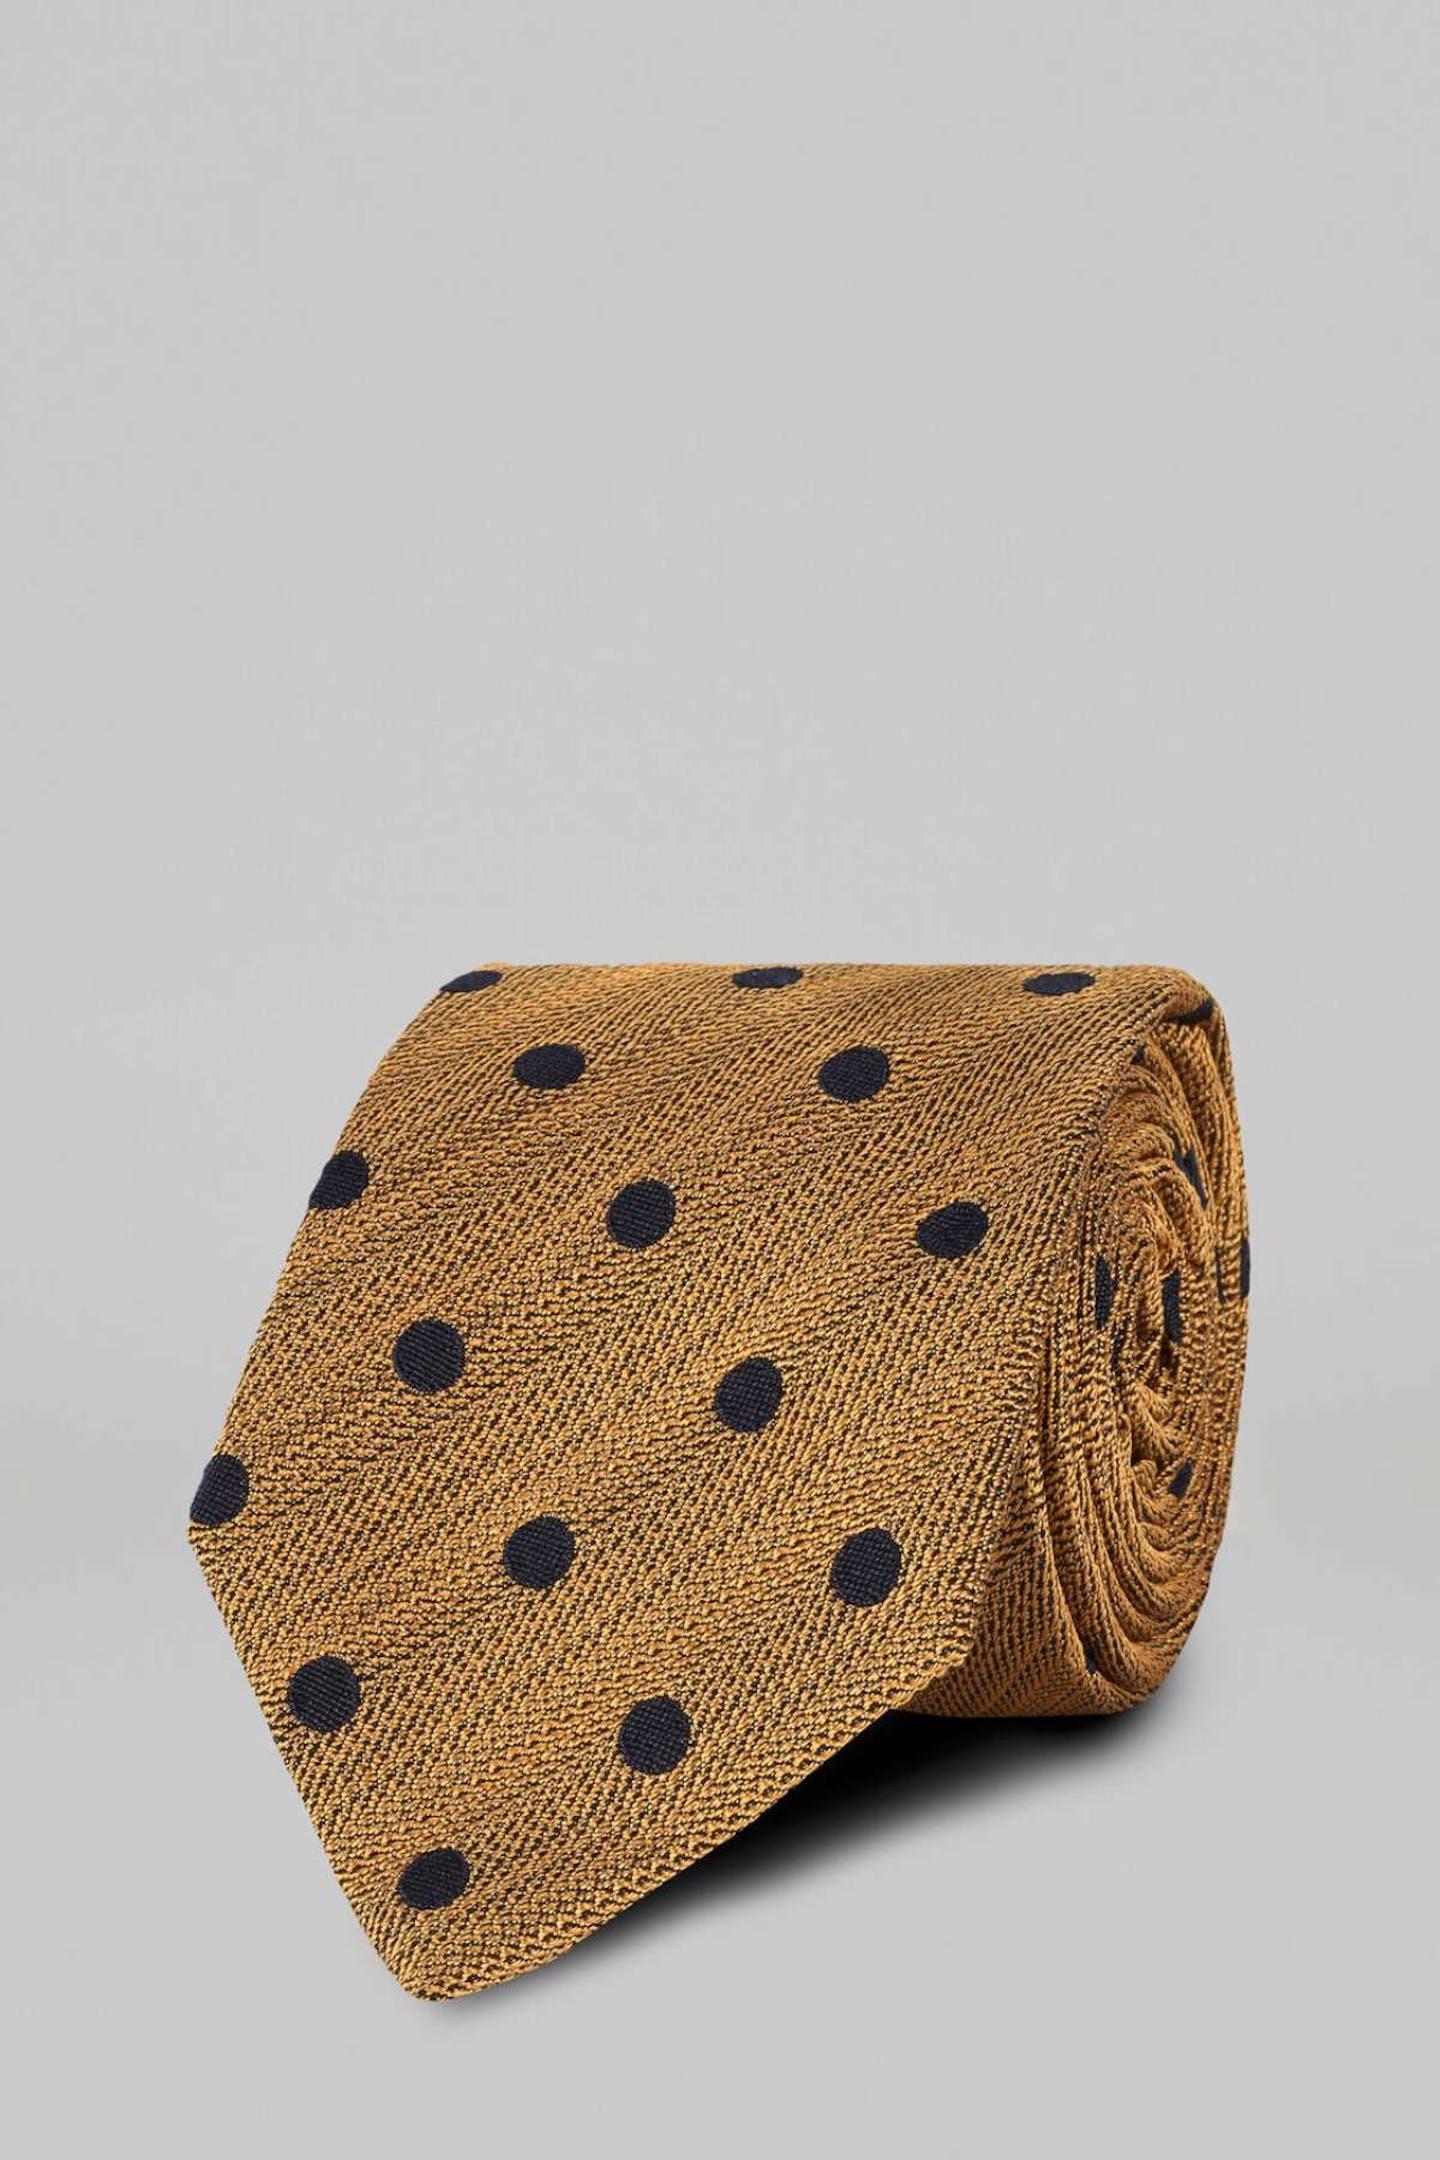 Christmas ideas for men polka-dot tie by Boggi Milano